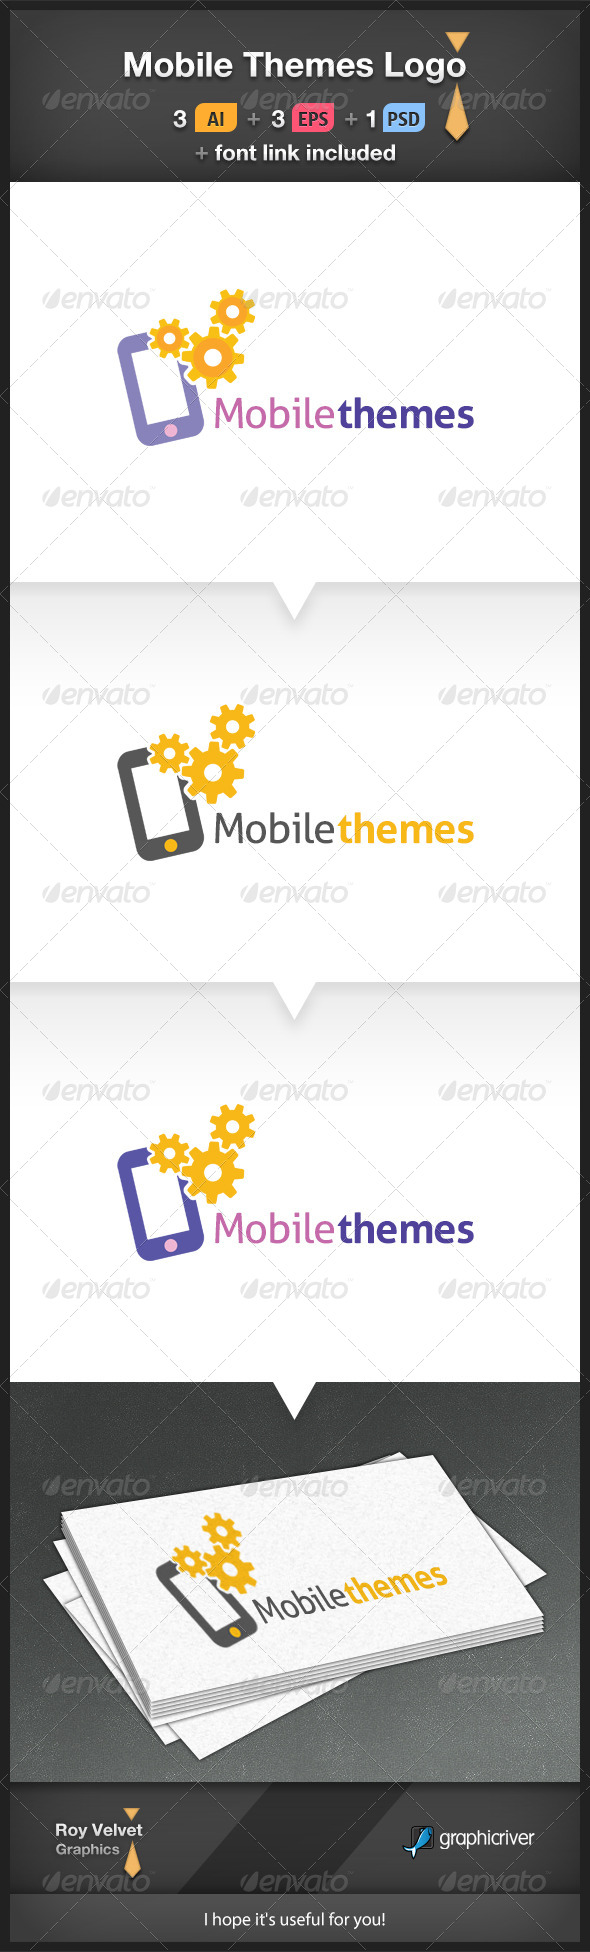 GraphicRiver Mobile Themes Logo 6219496